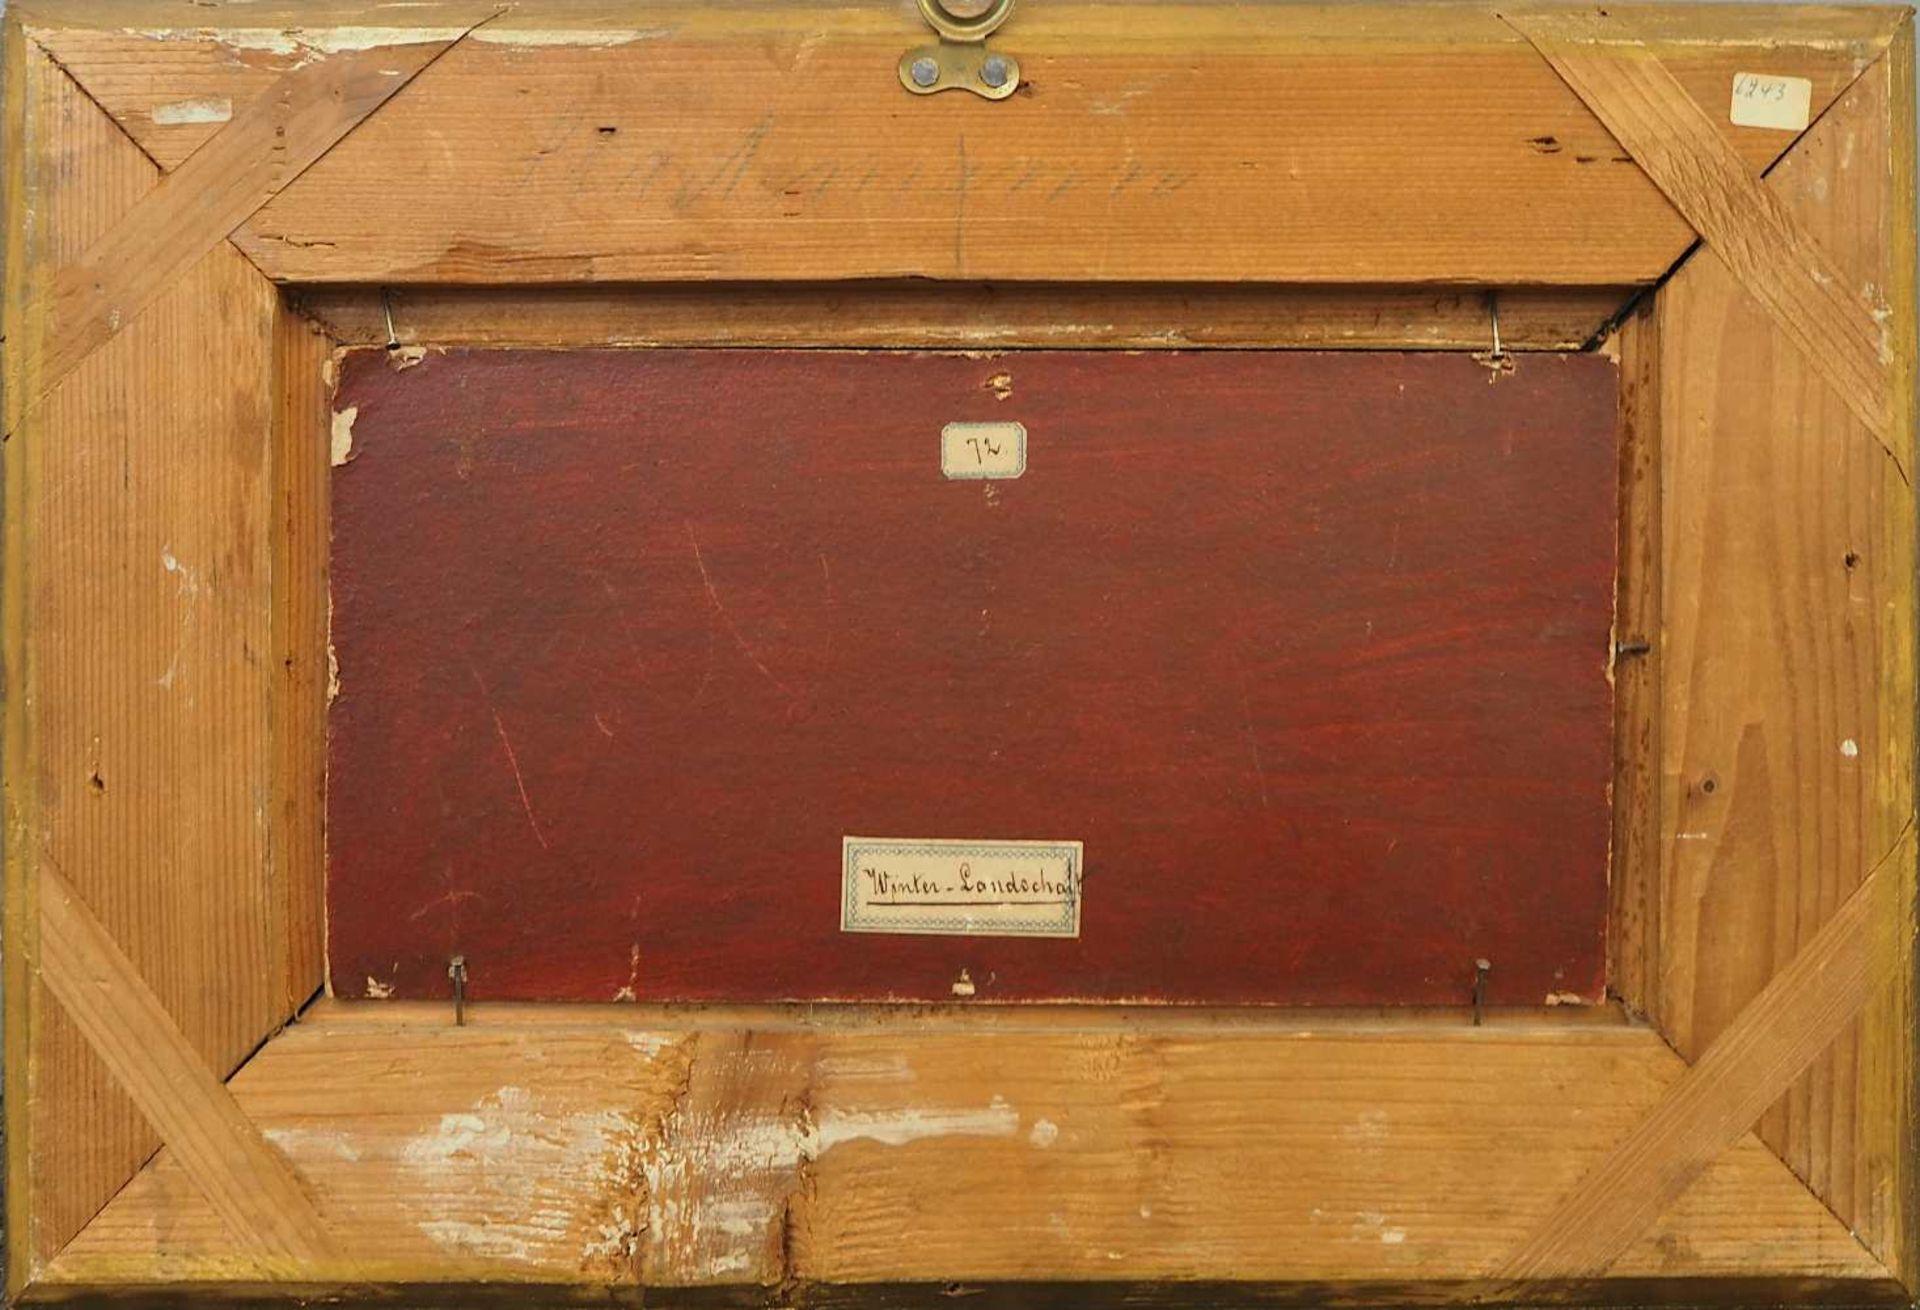 "1 Ölgemälde unsign. wohl um 1900, ""Eisvergnügen"", Öl/Platte, ca. 12x25,5cm, Craque - Bild 3 aus 3"